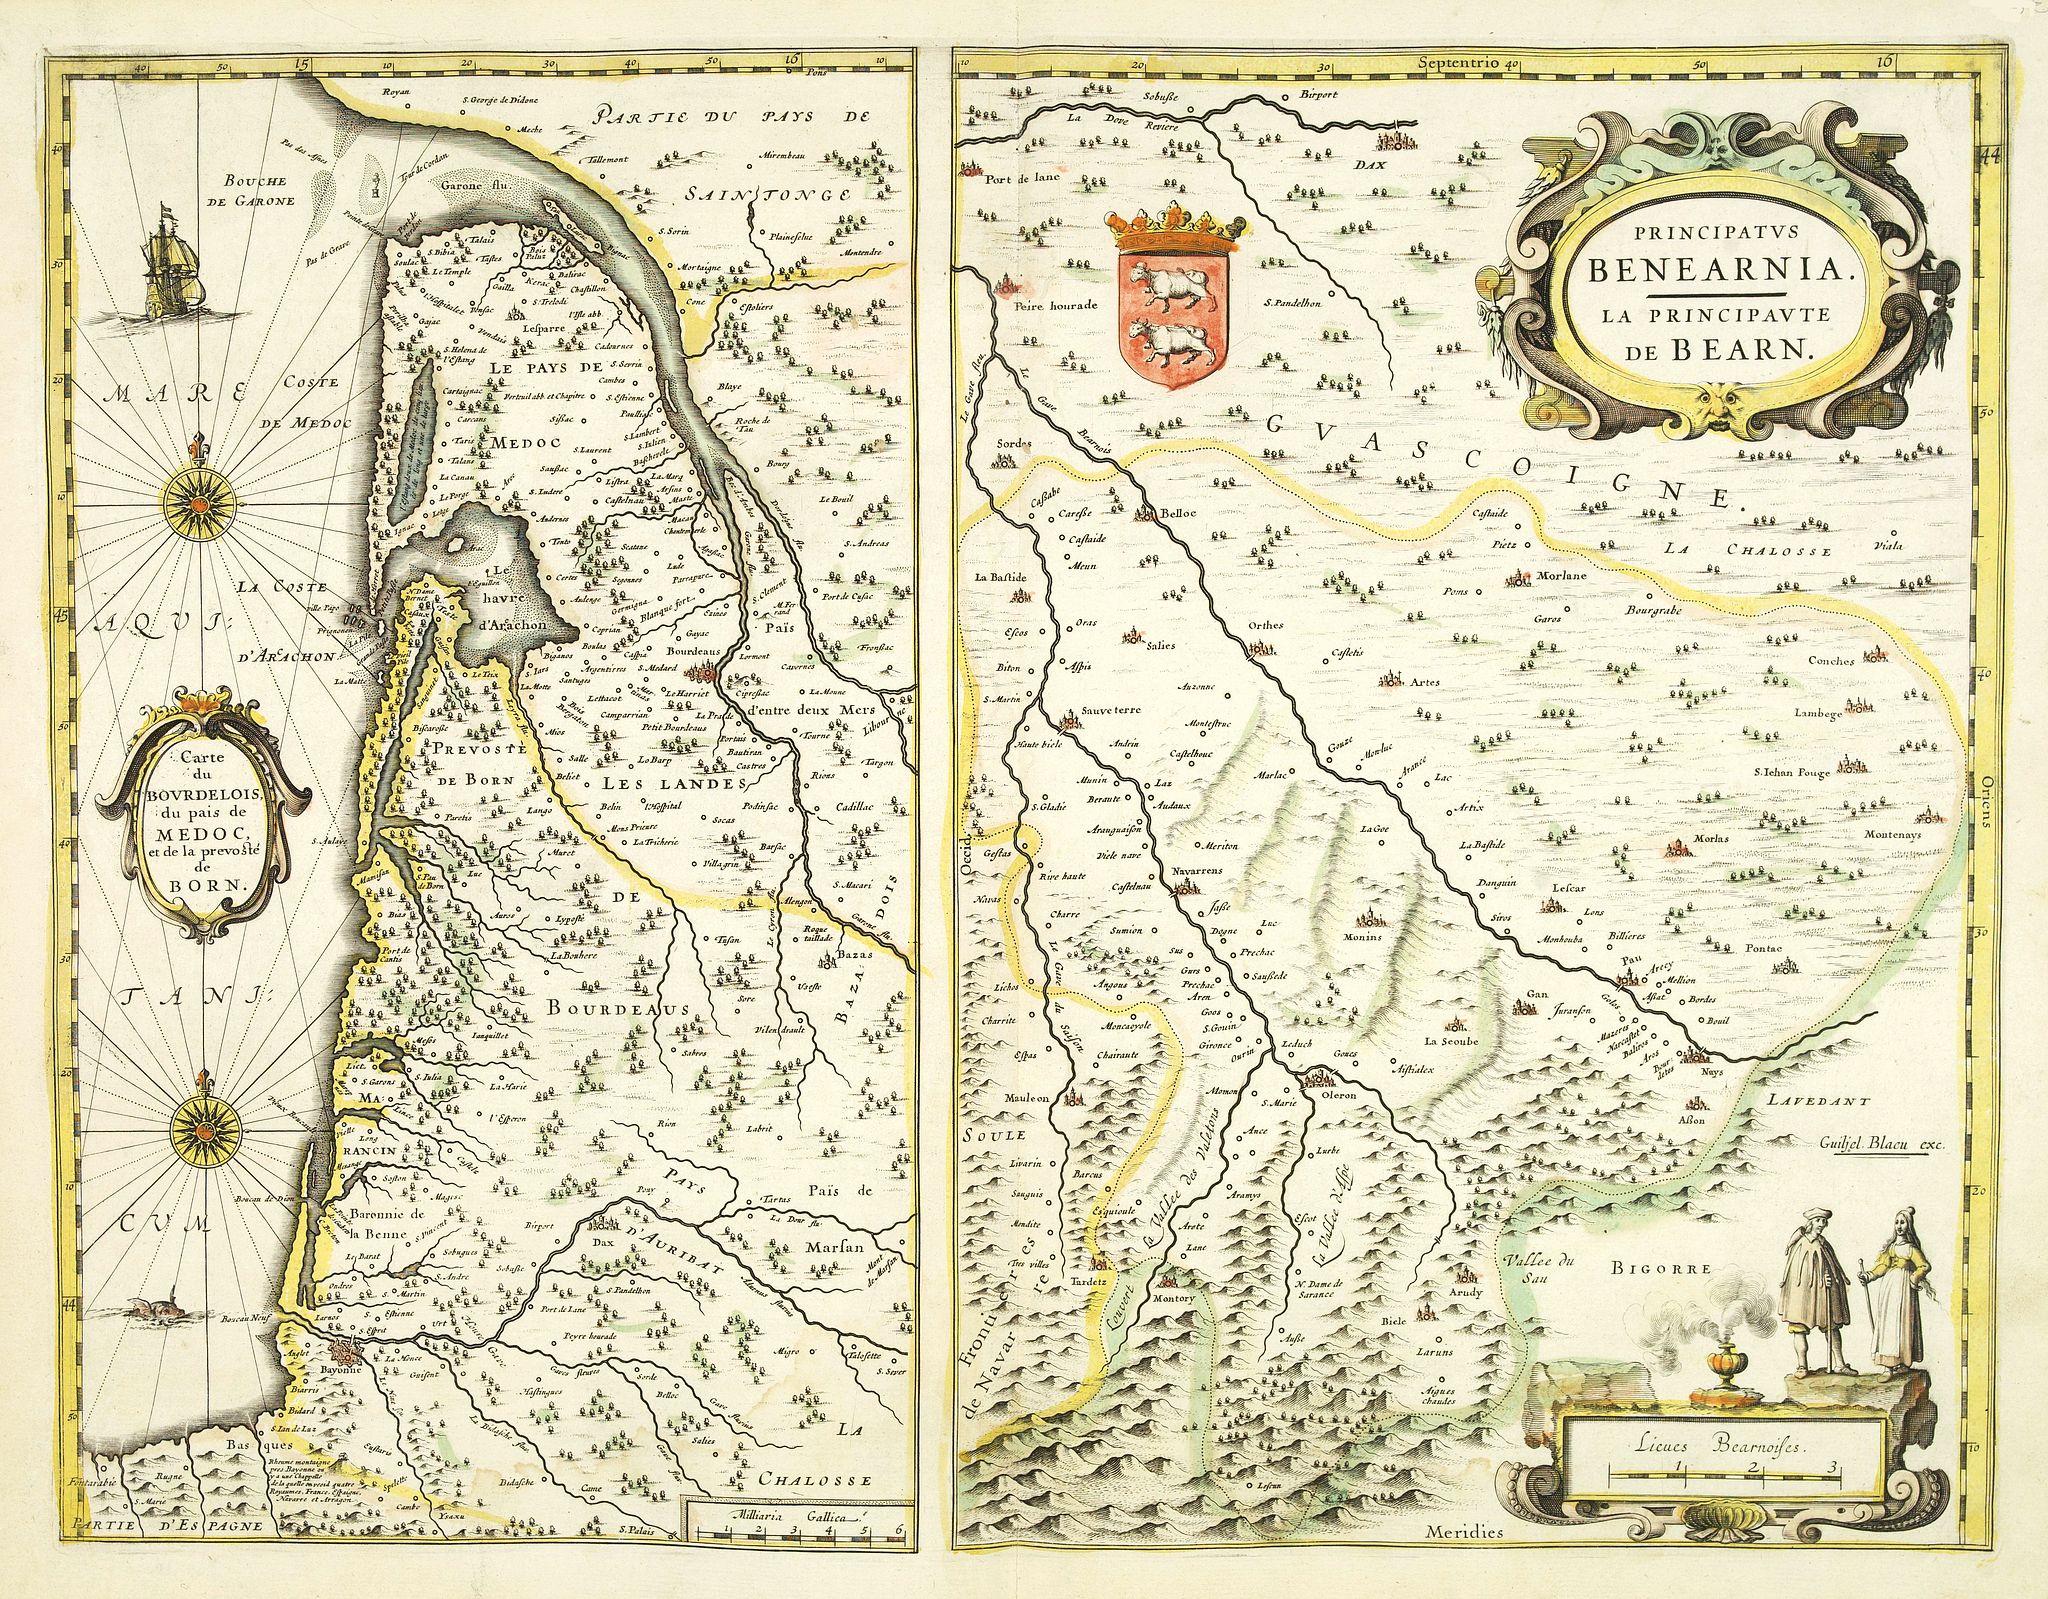 BLAEU, W. -  Carte du Bourdelois du paid de Medo, et de la prevoste de Born. [with] Principatus Benearnia. . .